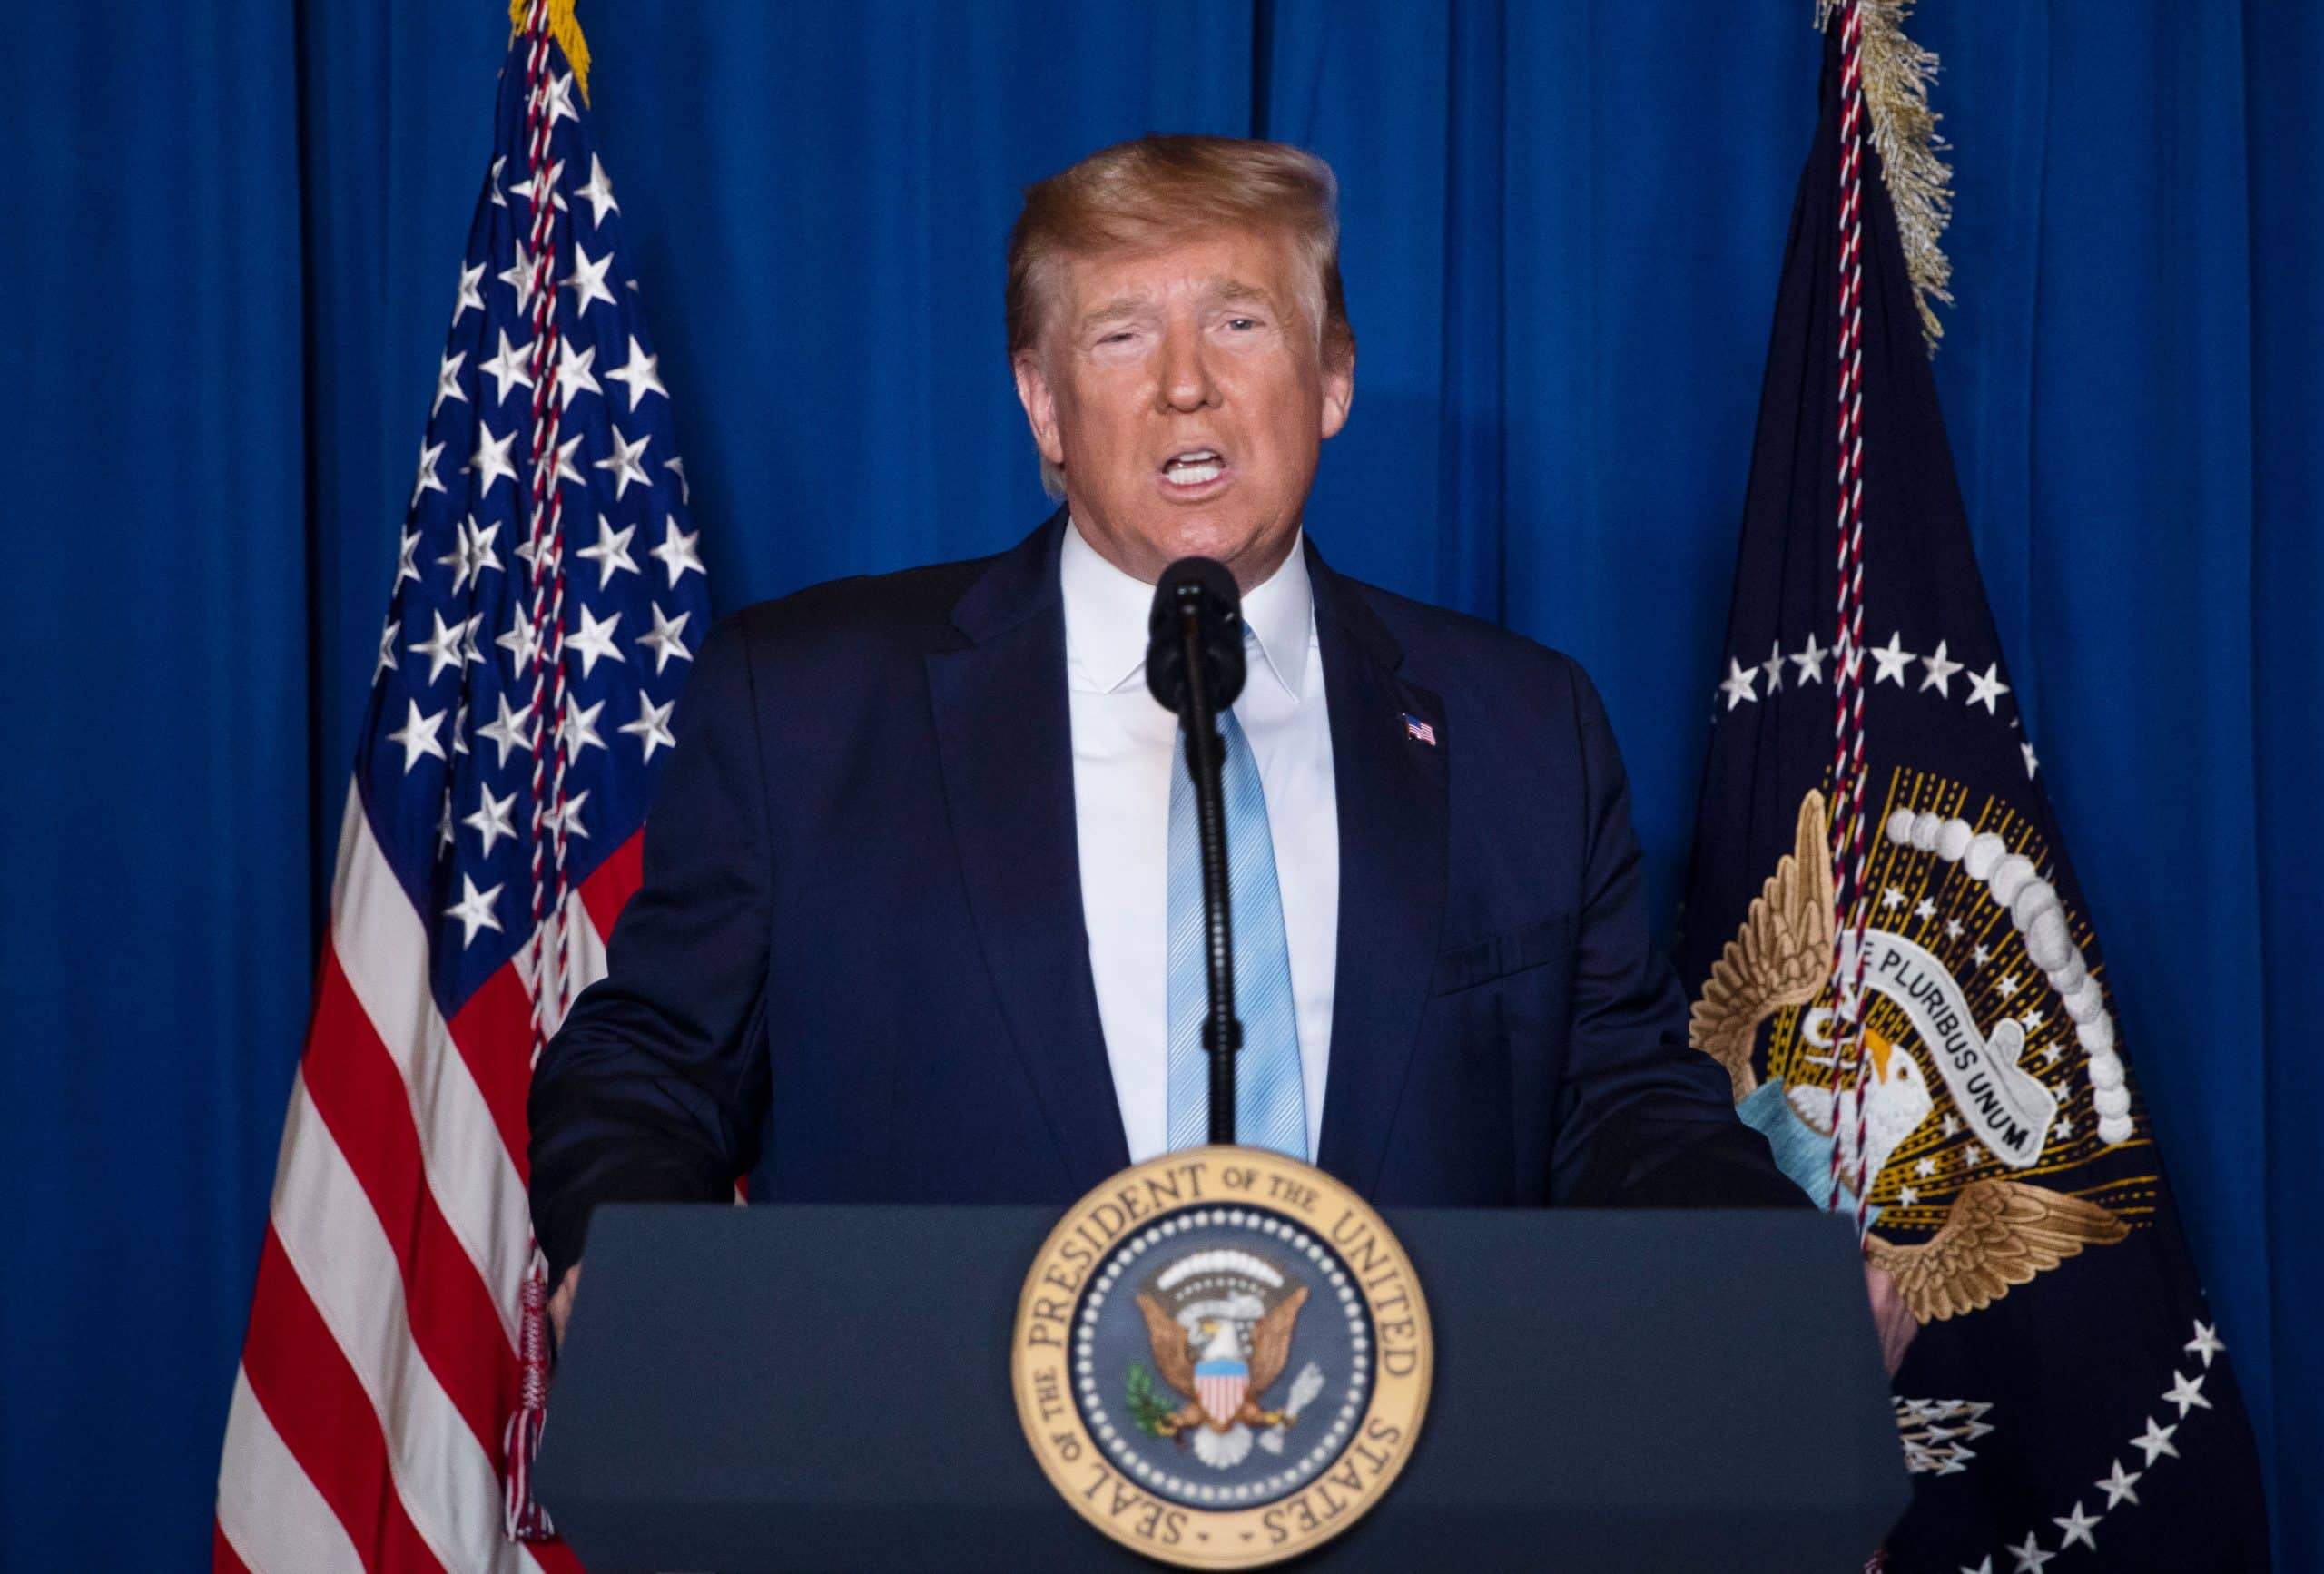 Trump threatens to hit 52 Iranian targets if Tehran retaliates over top general's death